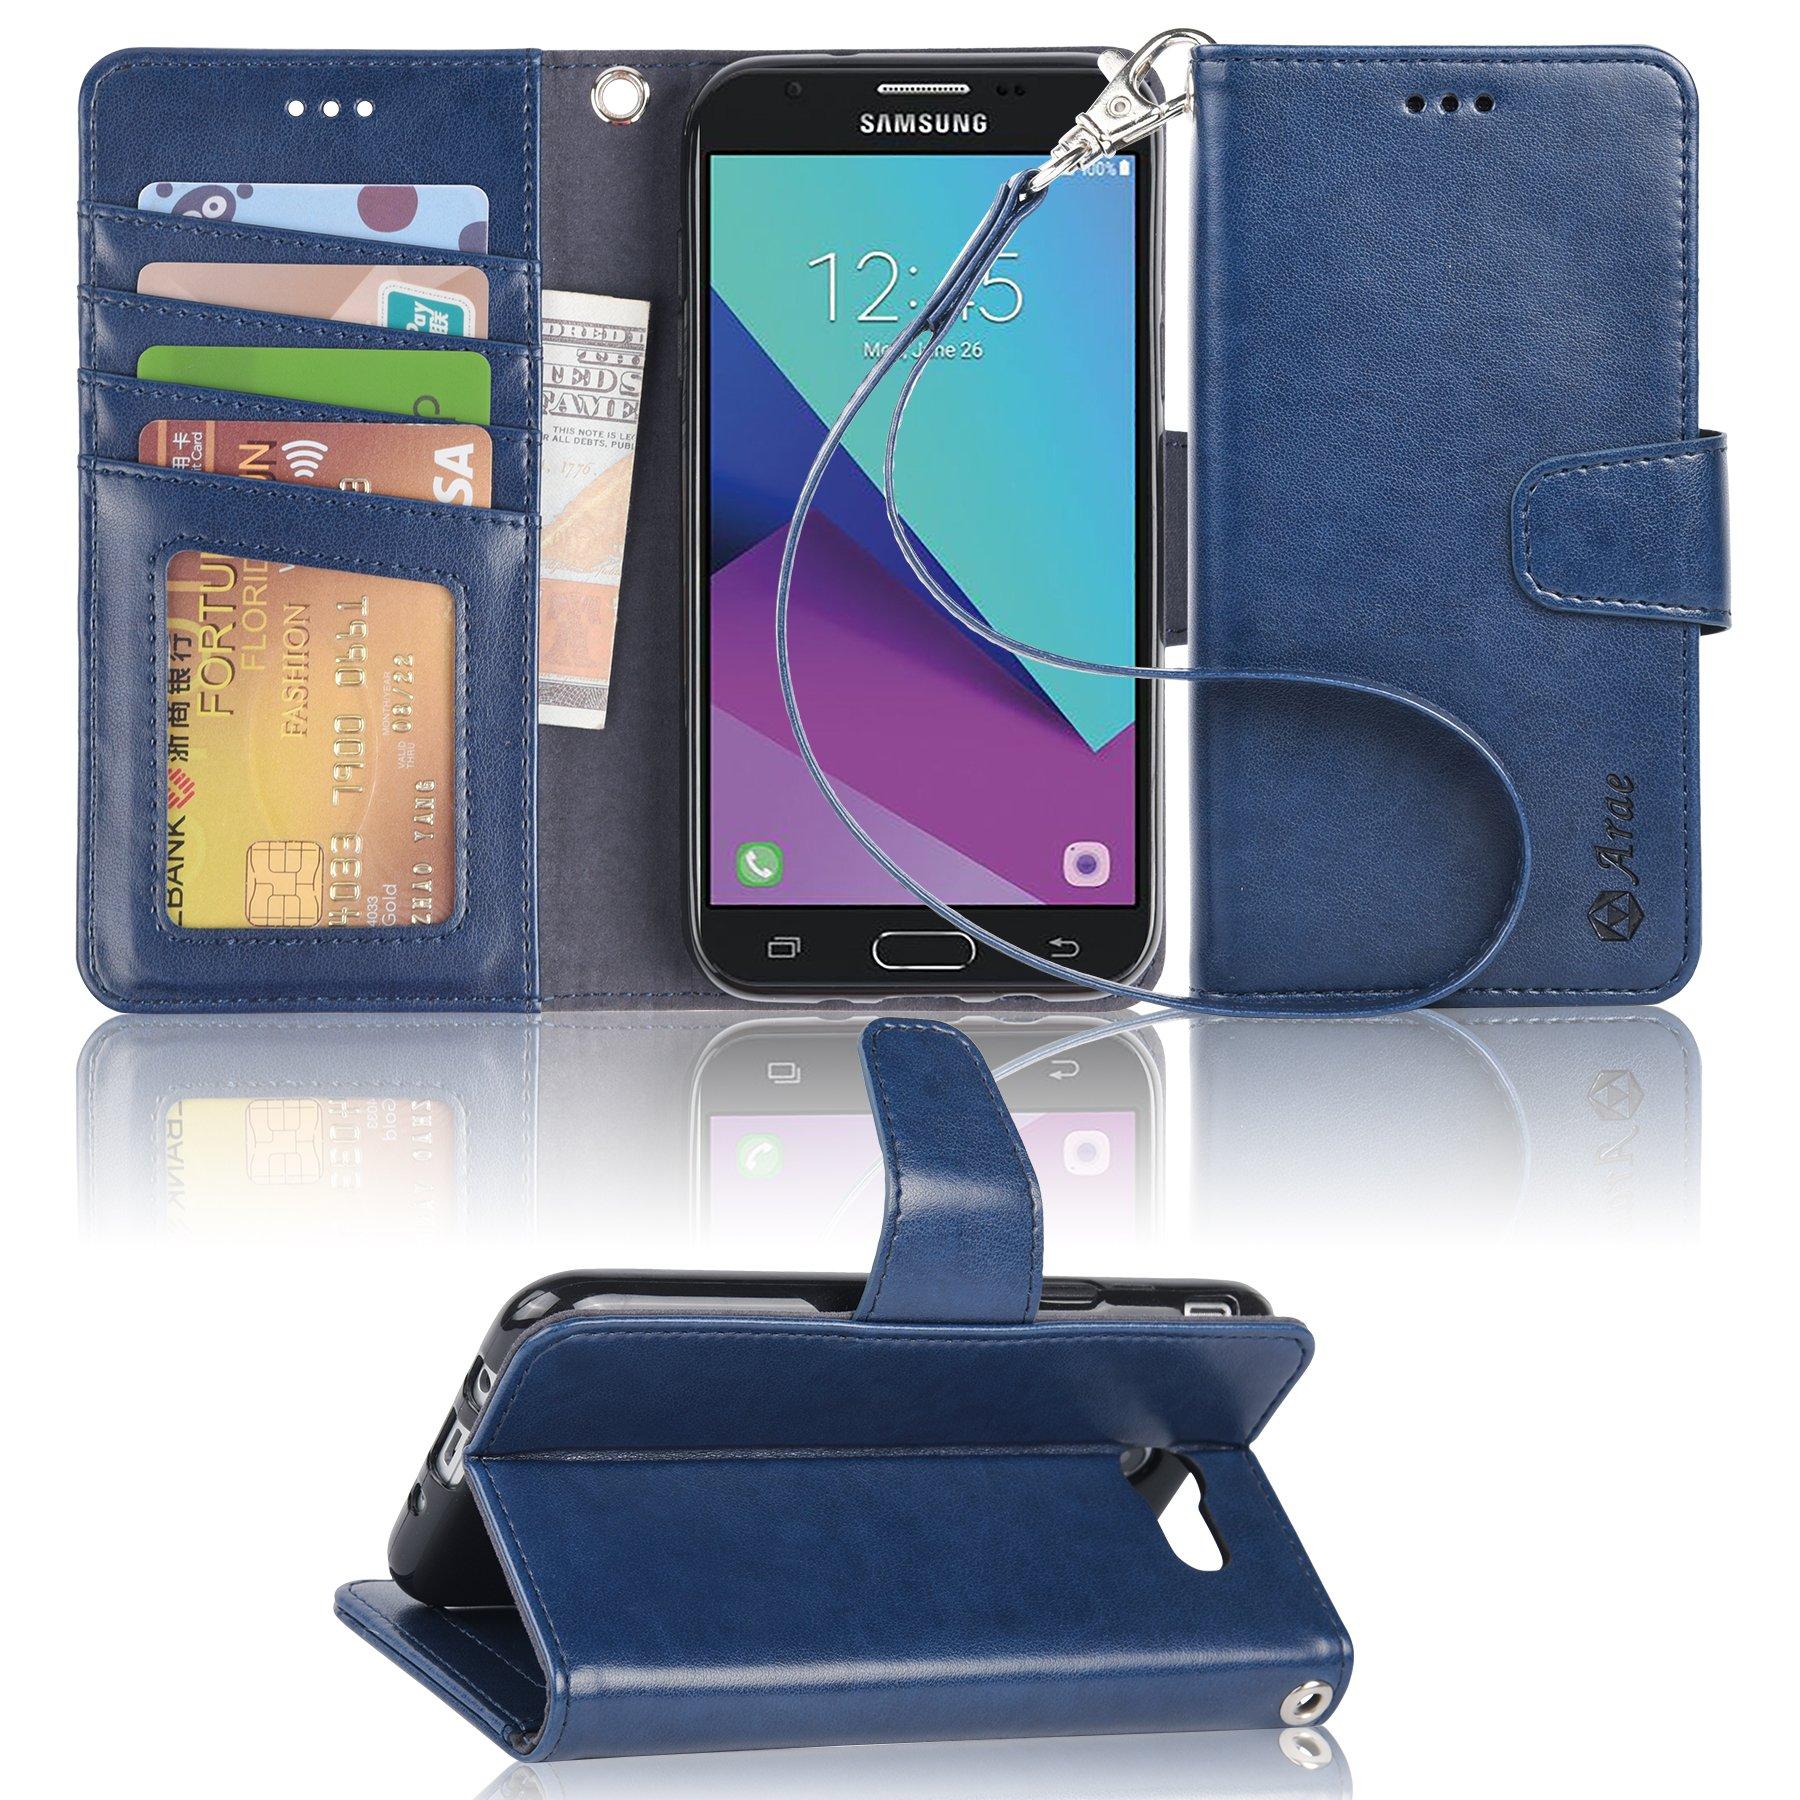 Galaxy J7 V / J7 2017 / J7 Prime / J7 Perx / J7 Sky Pro/Galaxy Halo Case, Arae Samsung Galaxy J7 2017 Wallet Case with Kickstand and Flip Cover, Blue